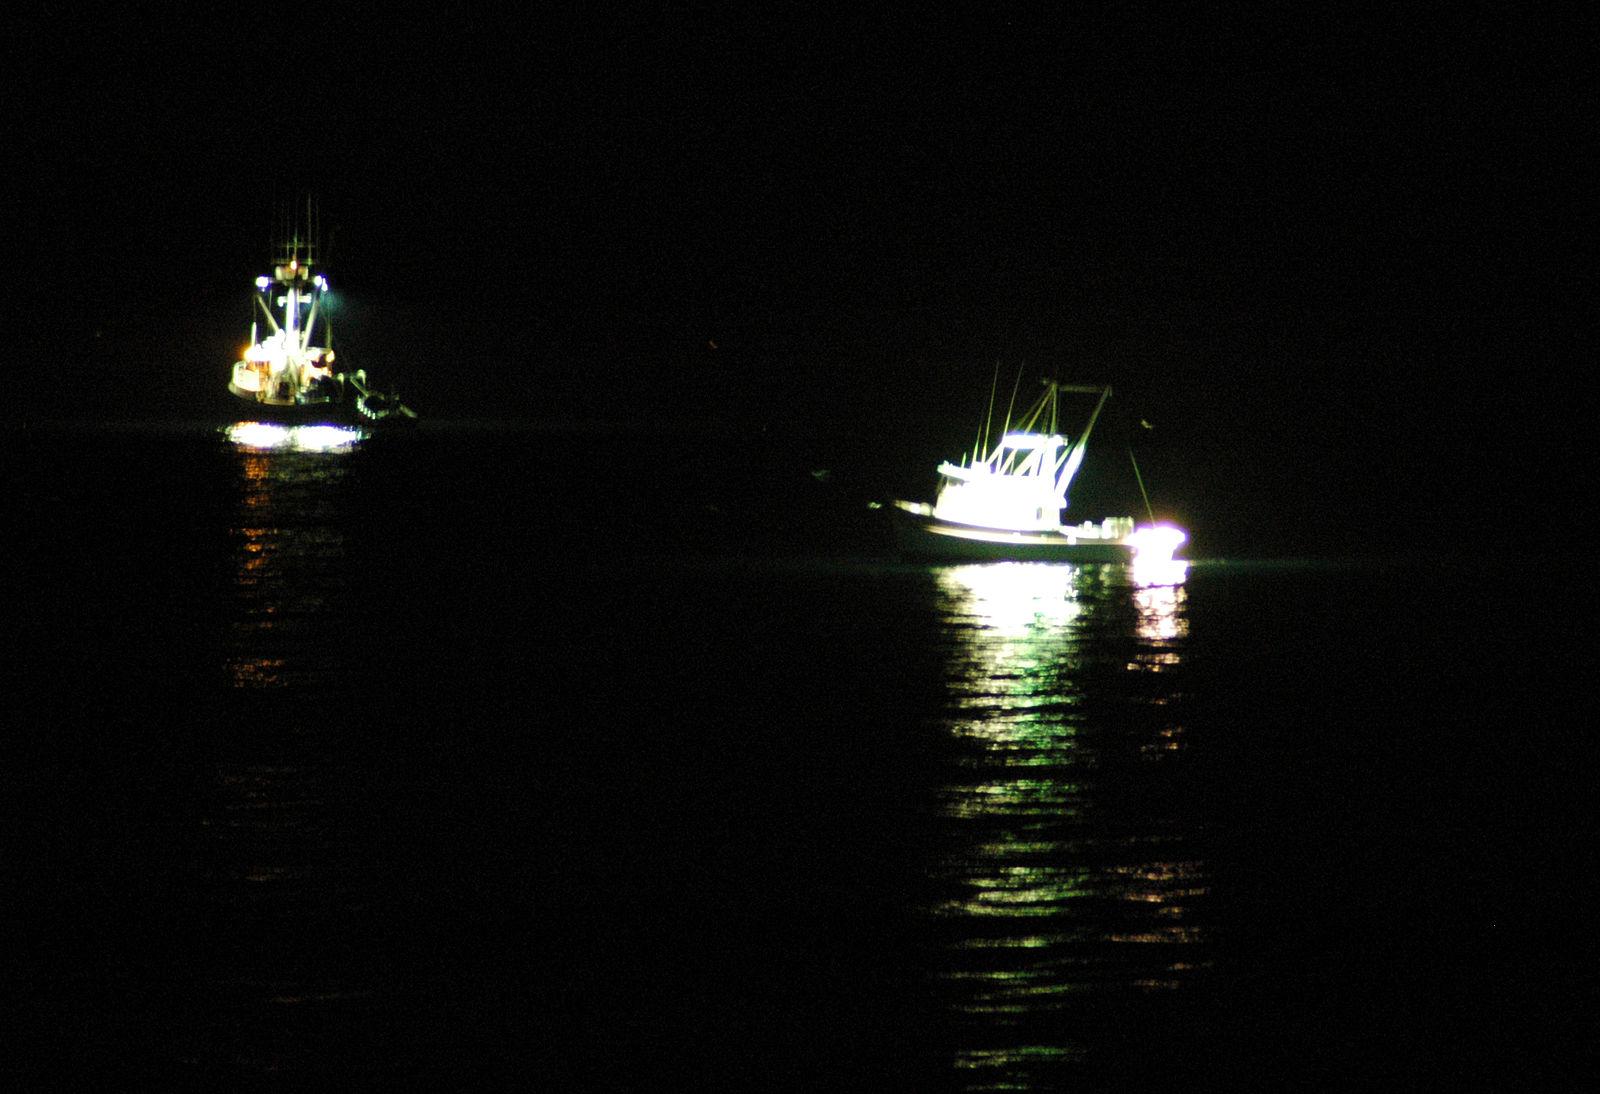 1600px-Squid_boats.jpg